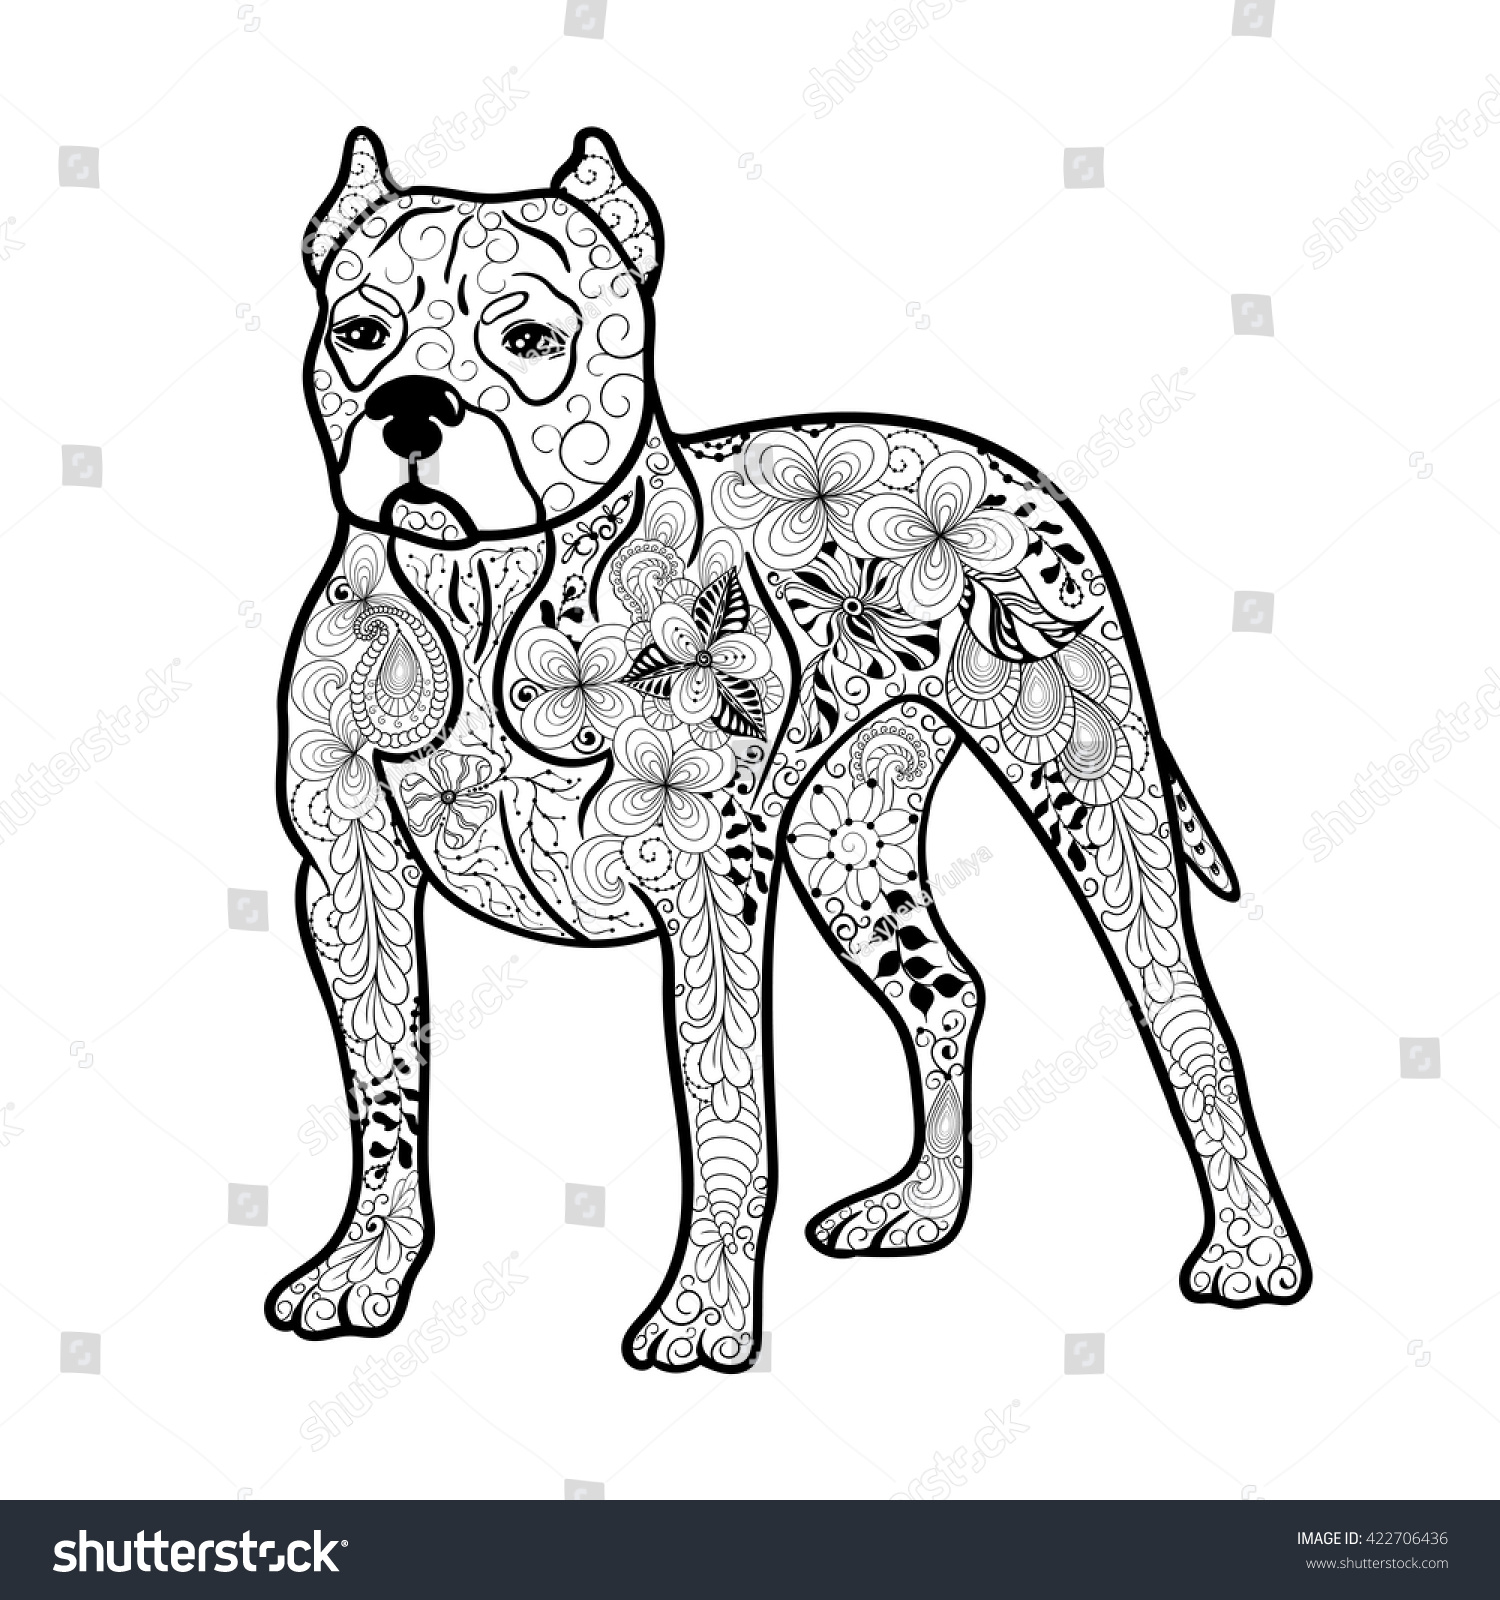 Illustration Pitbull Dog Created Doodling Style Stock Vector